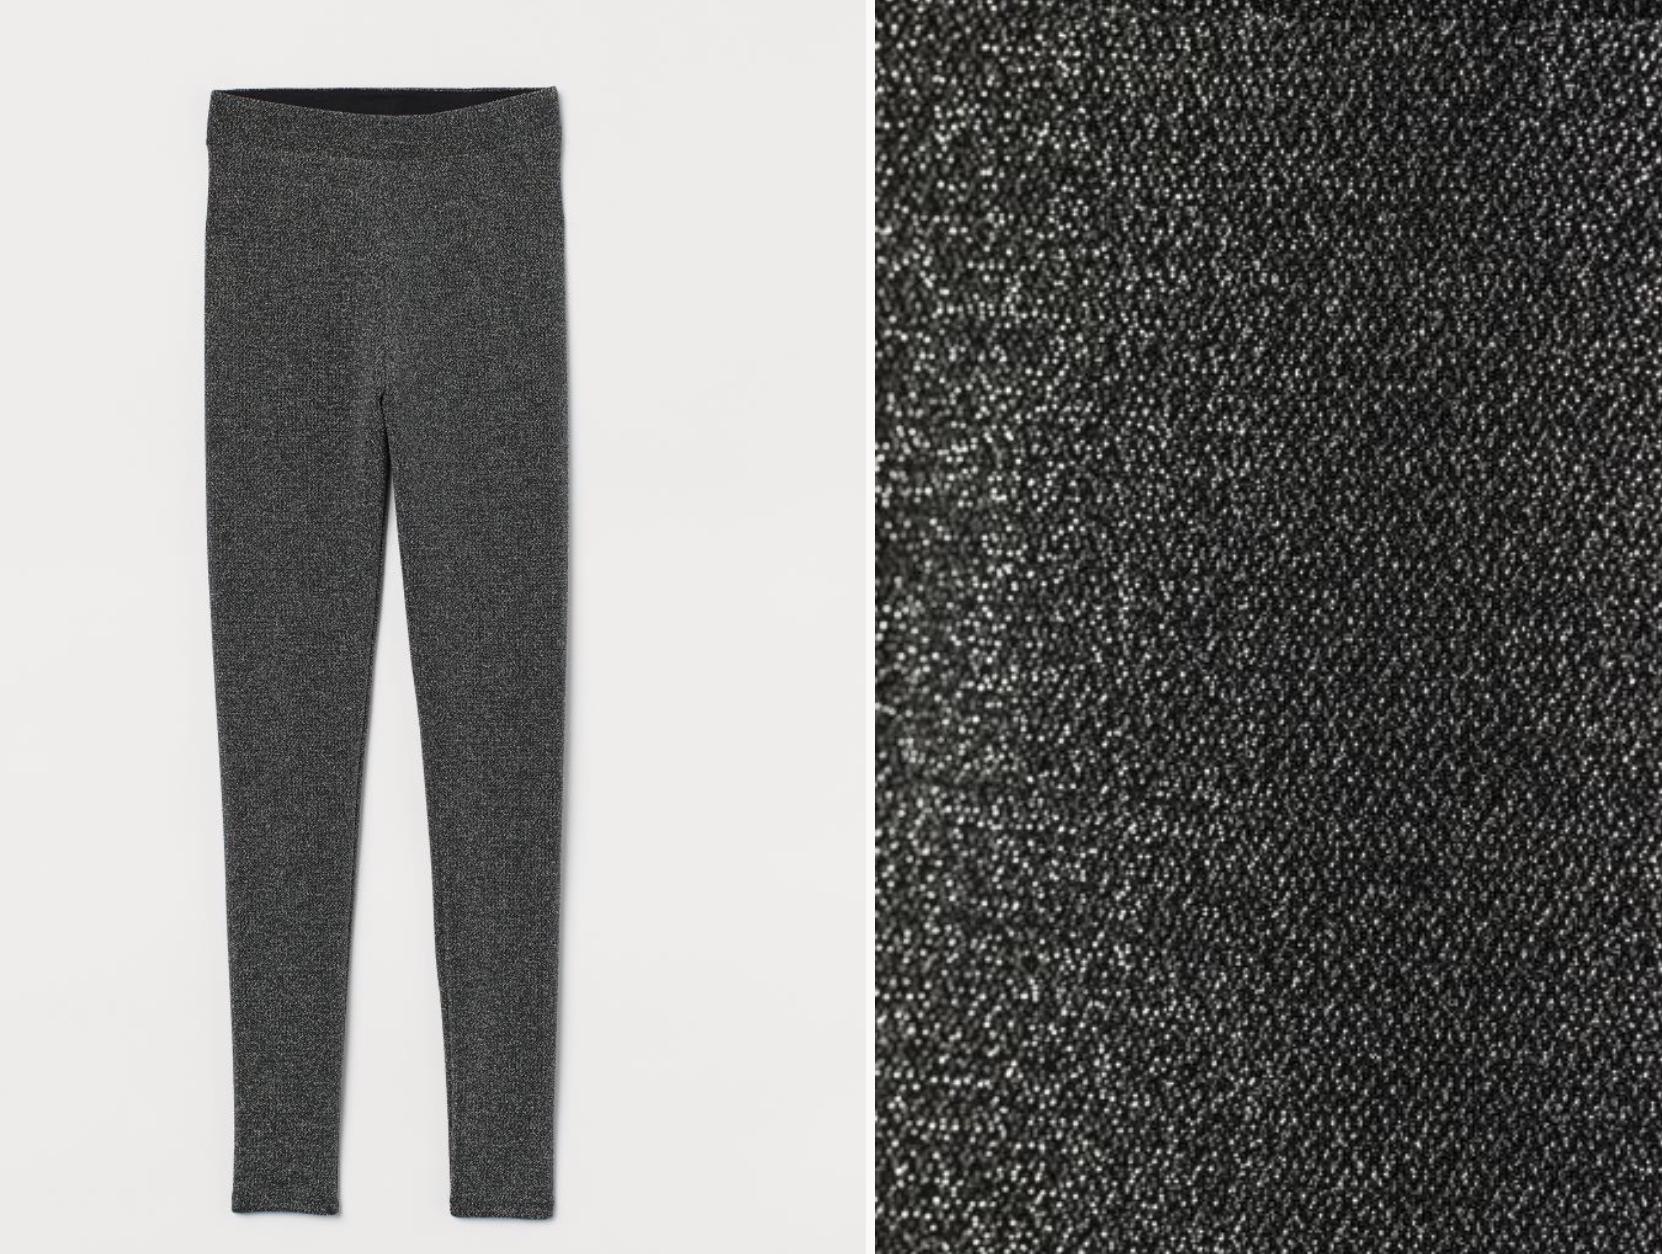 Pantalones metalizados de H&M